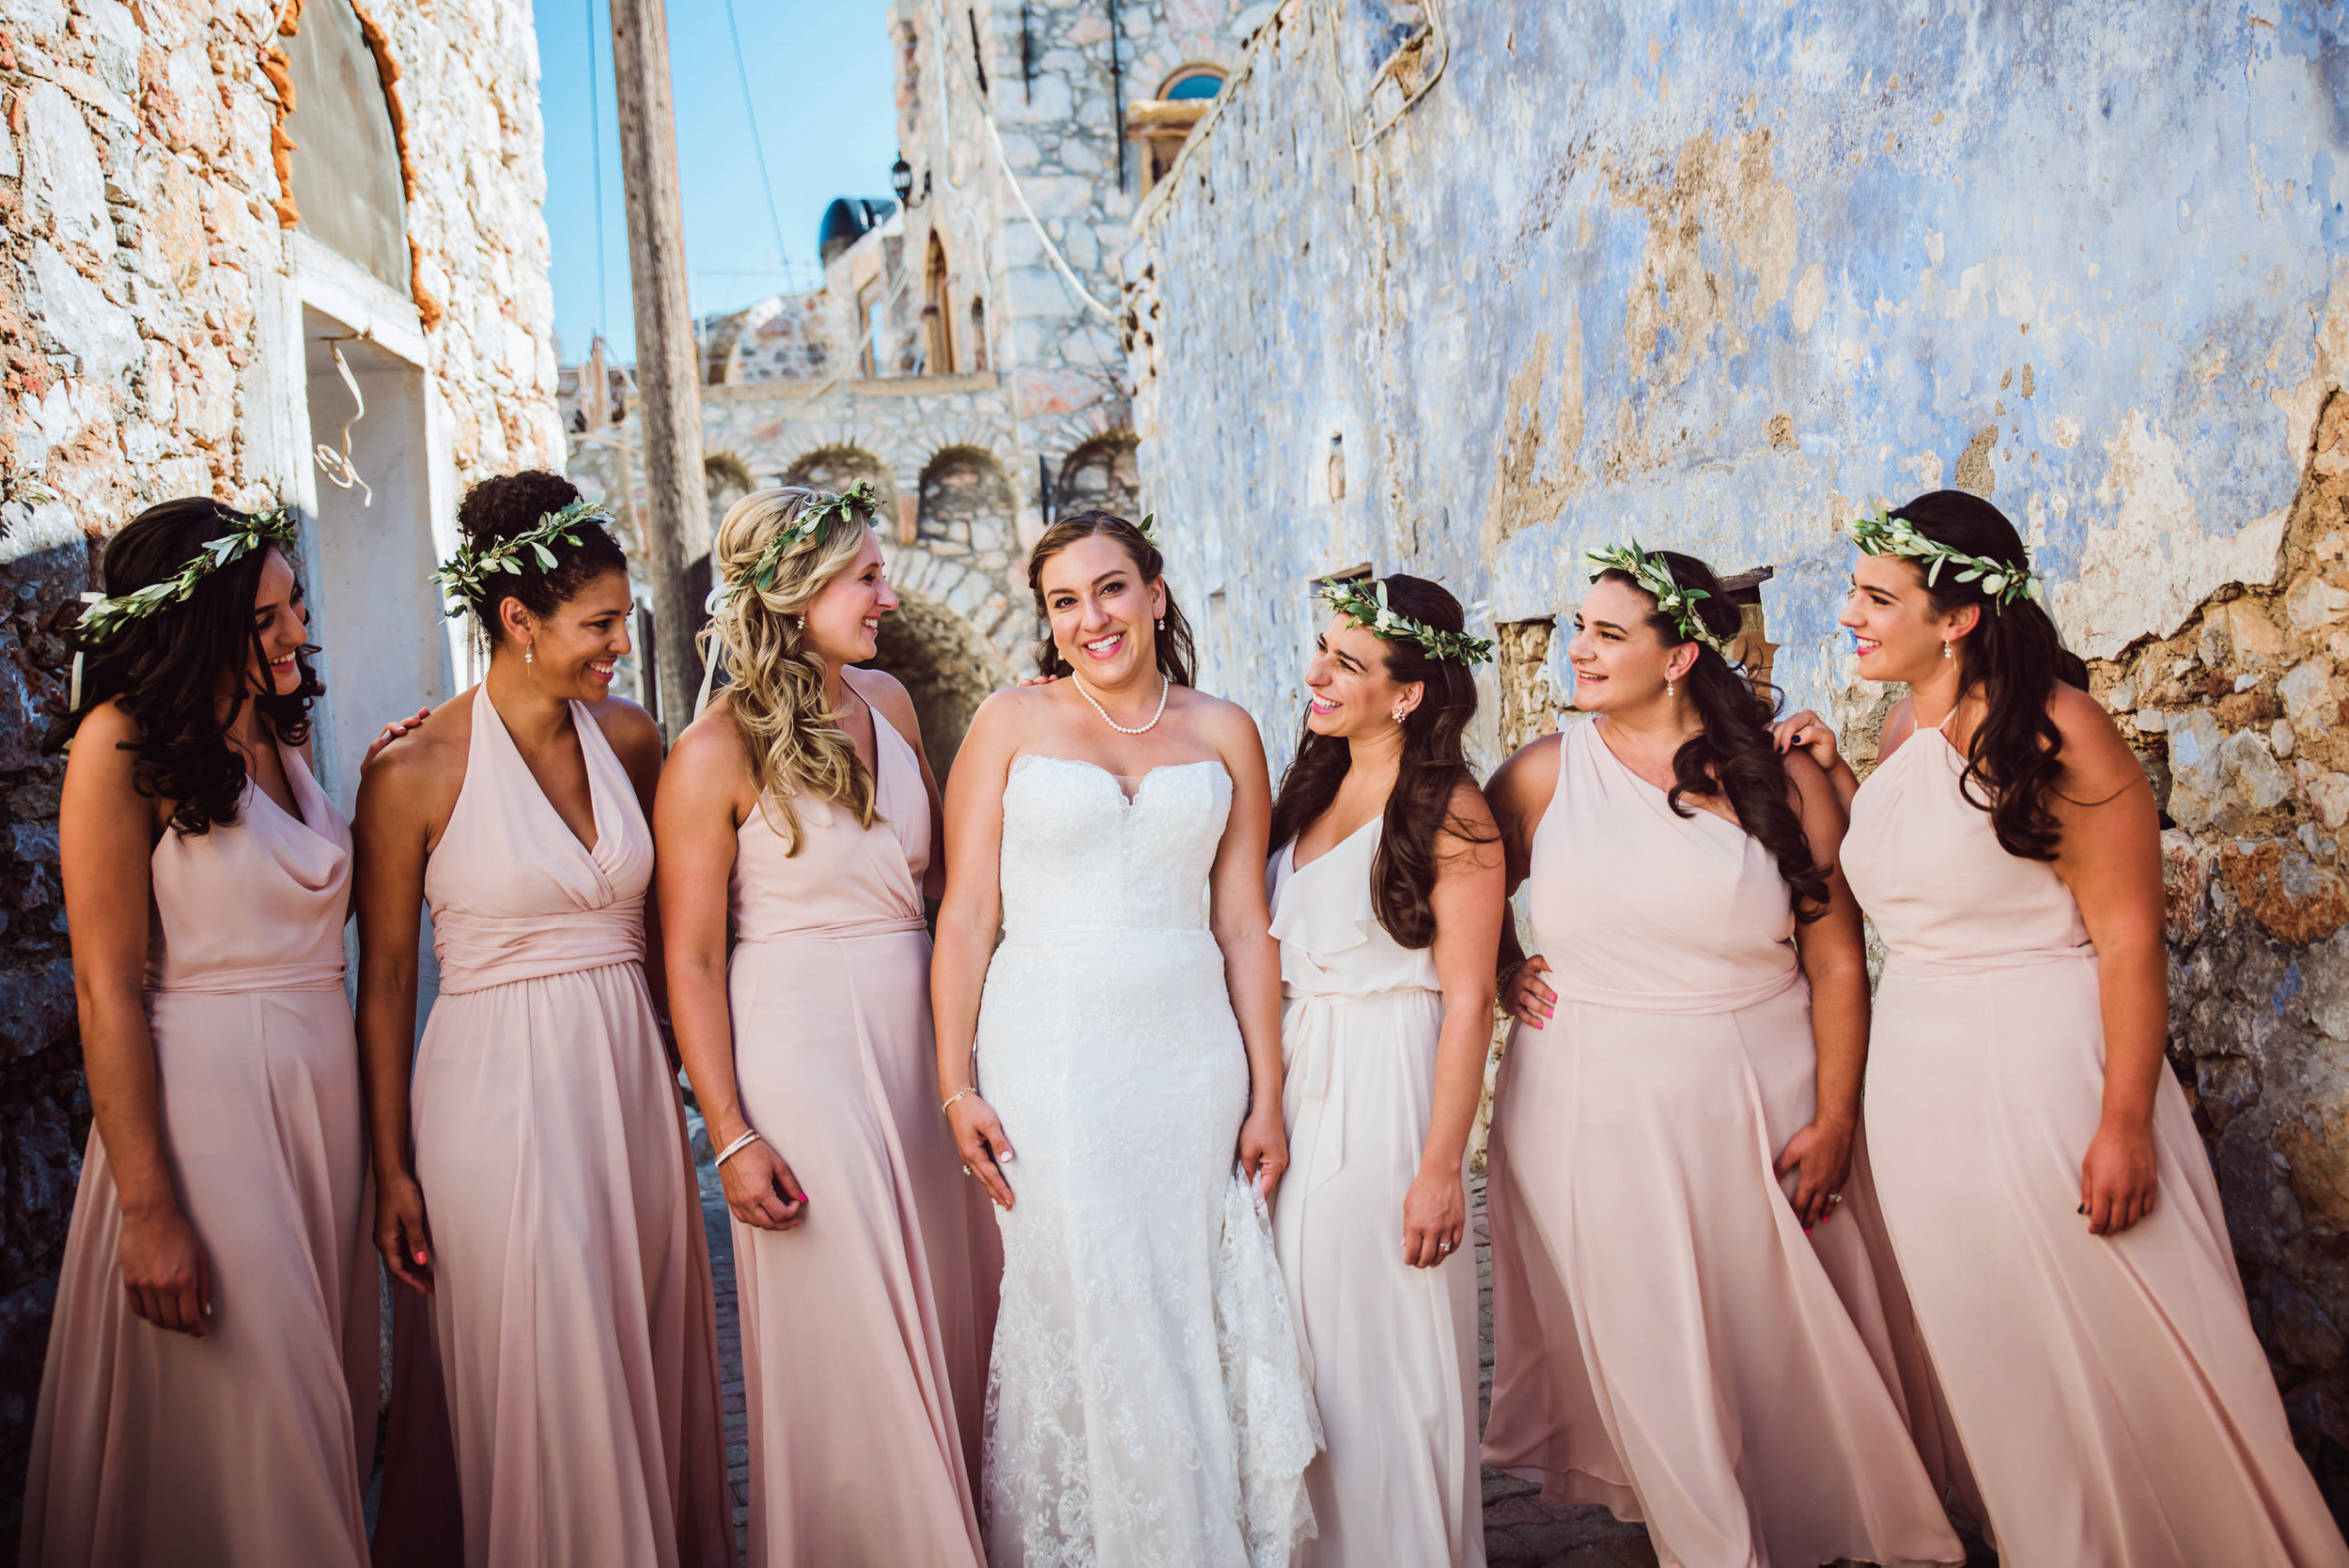 ChiosGreeceWedding-Trisha&Will-WeddingParty-Family-15.jpg